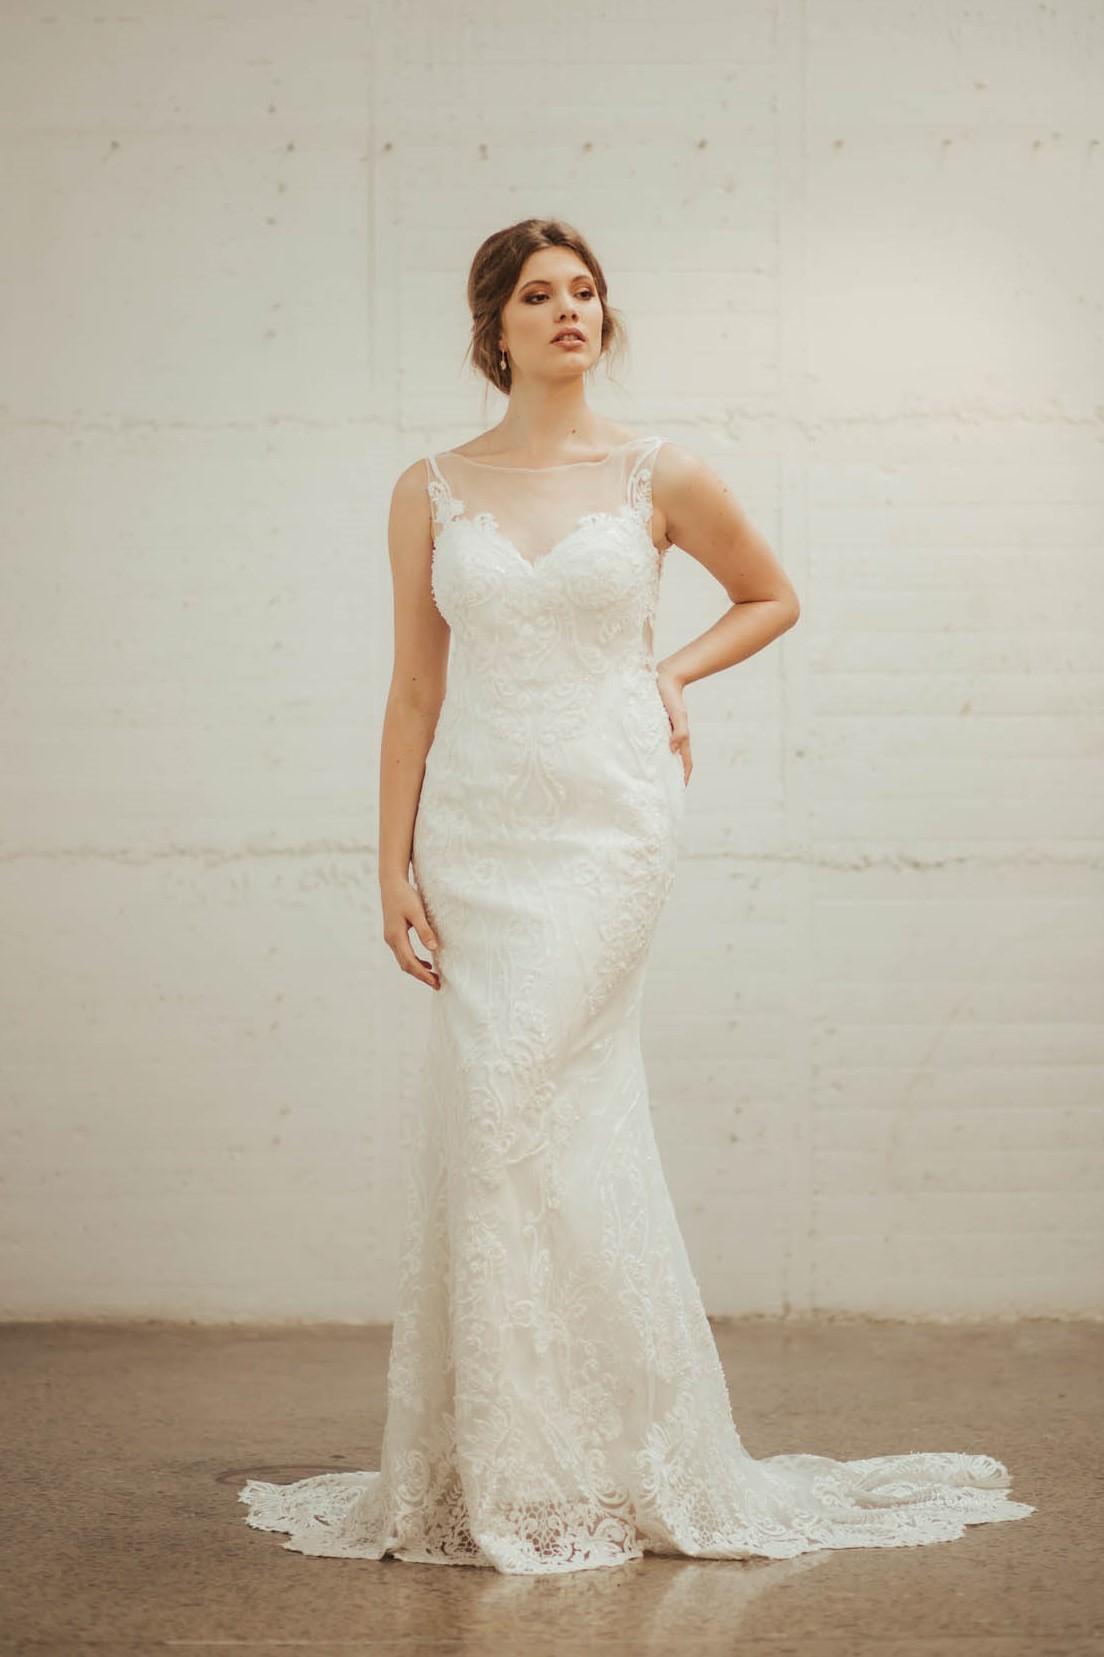 Lainee Hermsen Dahlia Wedding Dress Collection - Paperswan Bride - Wedding Dress Shop - Wellington - Christchurch - New Zealand